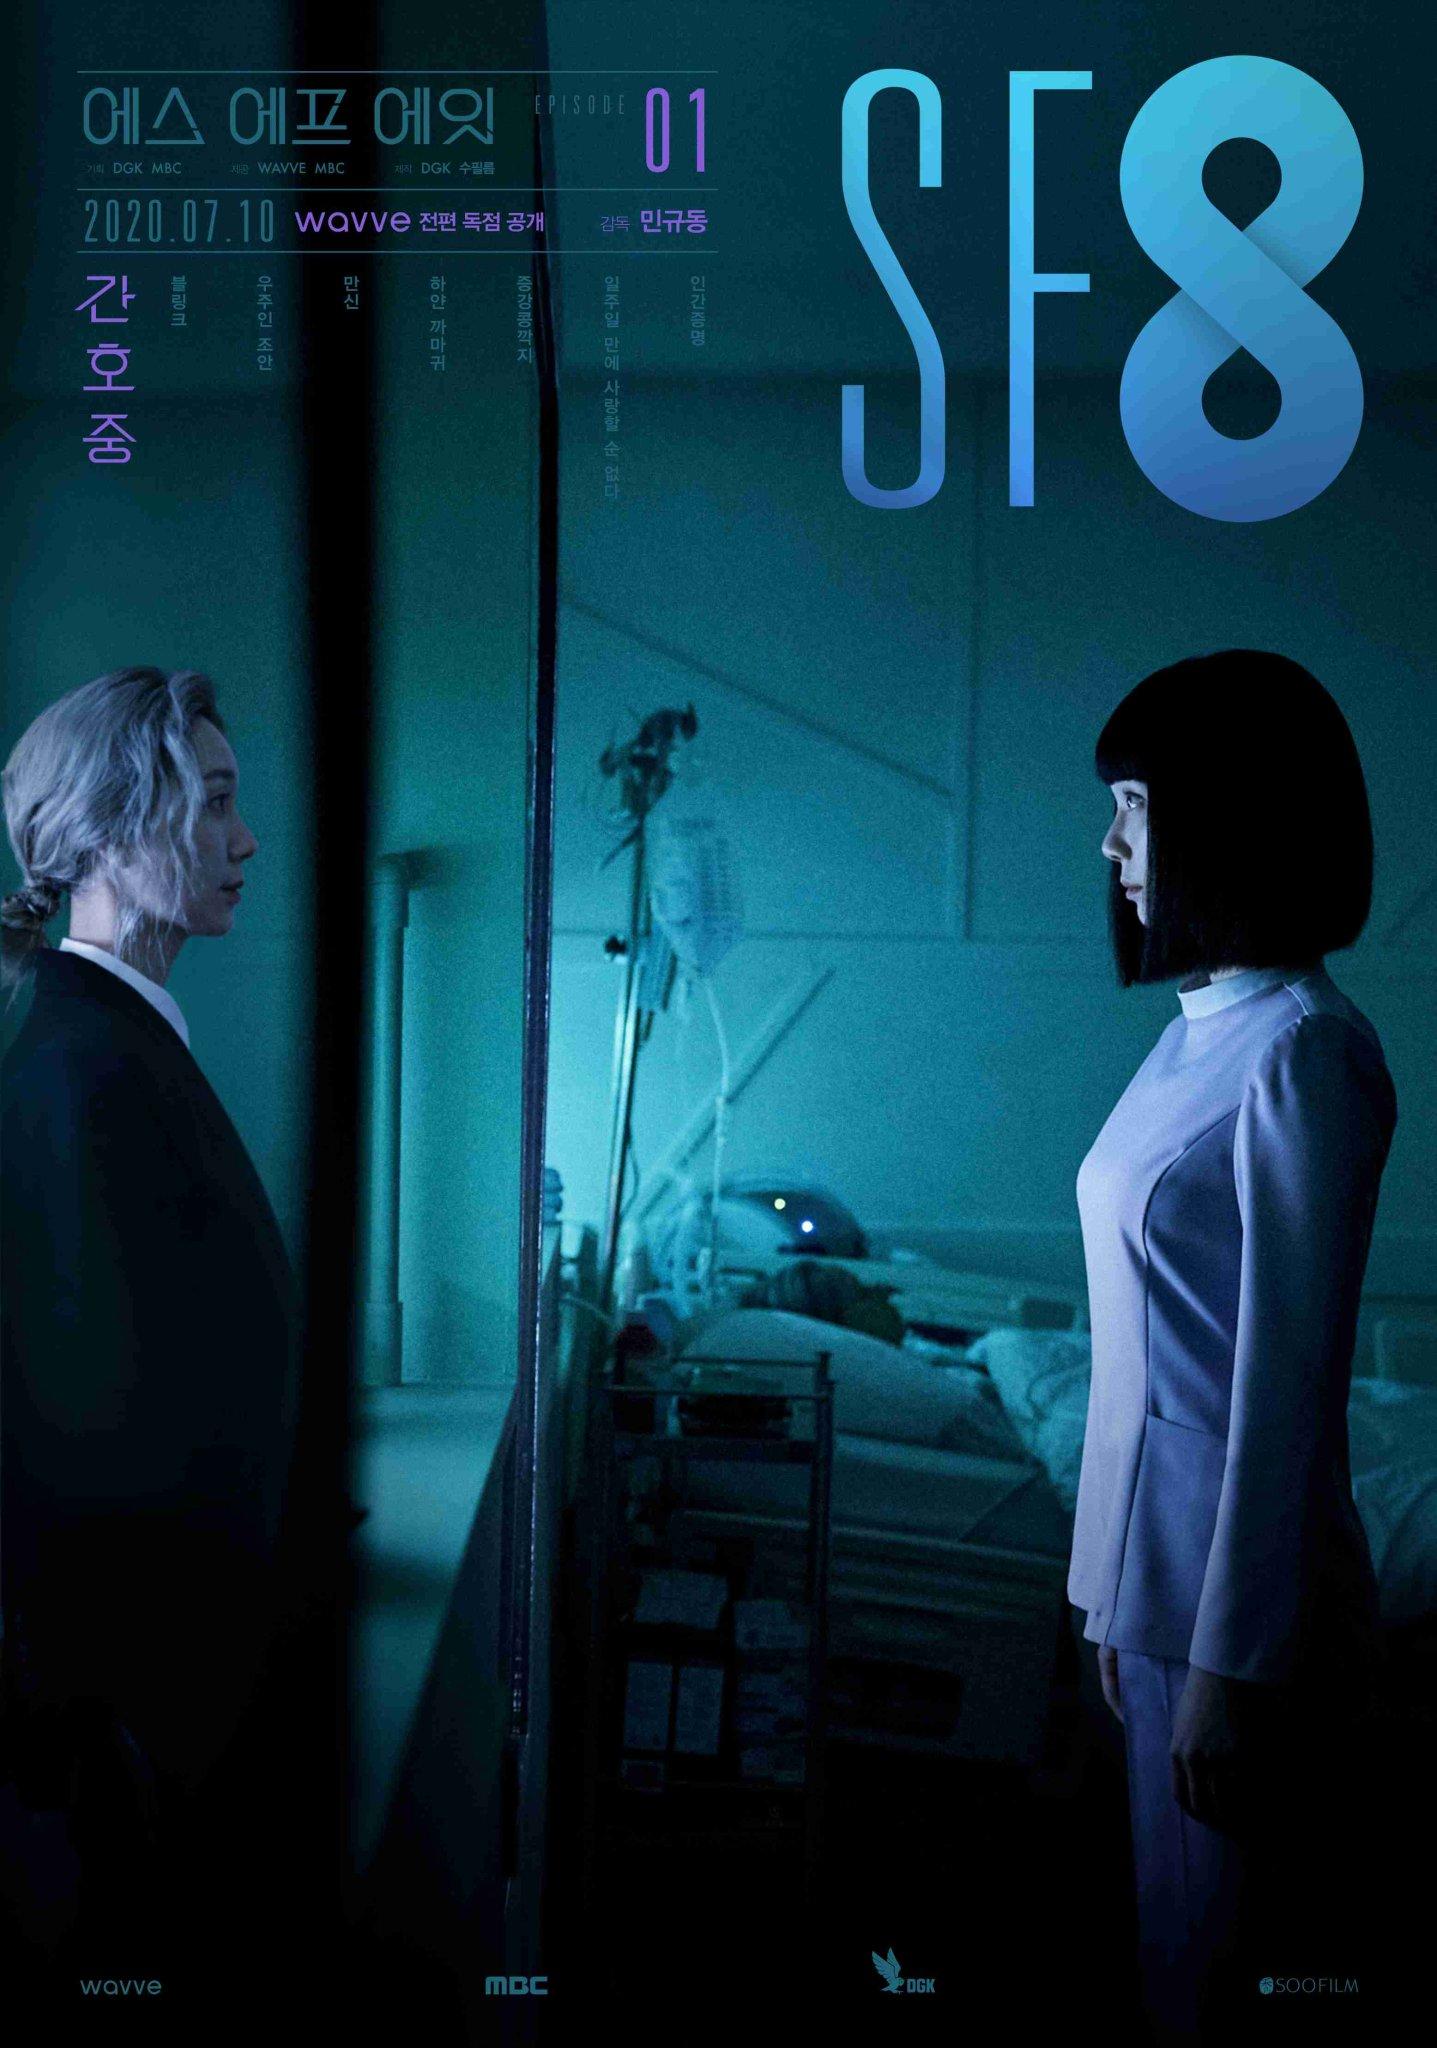 Sf8 The Prayer Asianwiki Vampire is a 2020 korean drama starring oh dong joon, kim chan kyu and kim dan. sf8 the prayer asianwiki